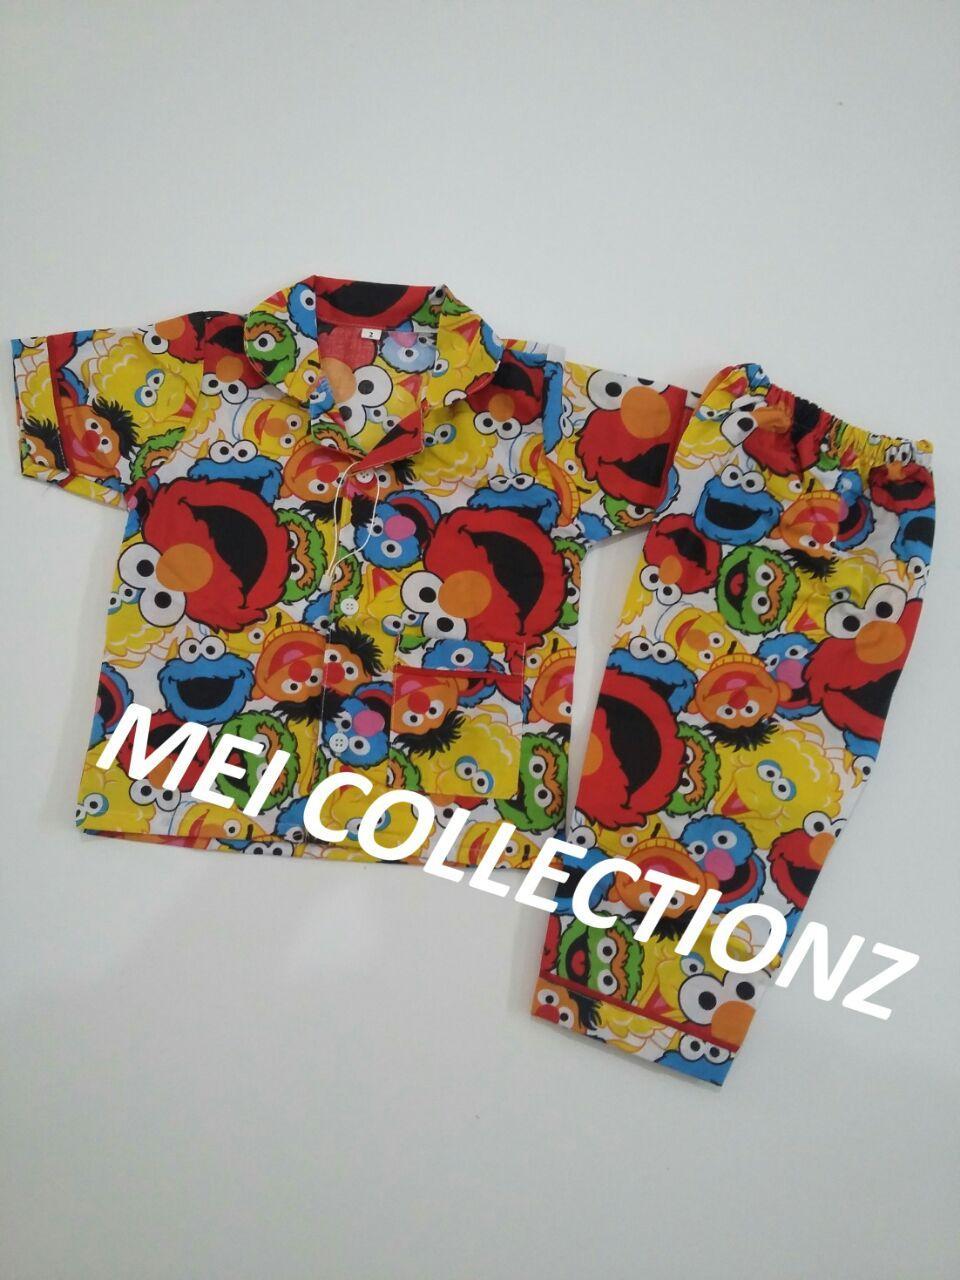 Mei Collectionz Piyama Anak Unisex Elmo Size 1 2 / Baju Tidur Anak Murah / Piyama Anak Murah / Baju Tidur Murah